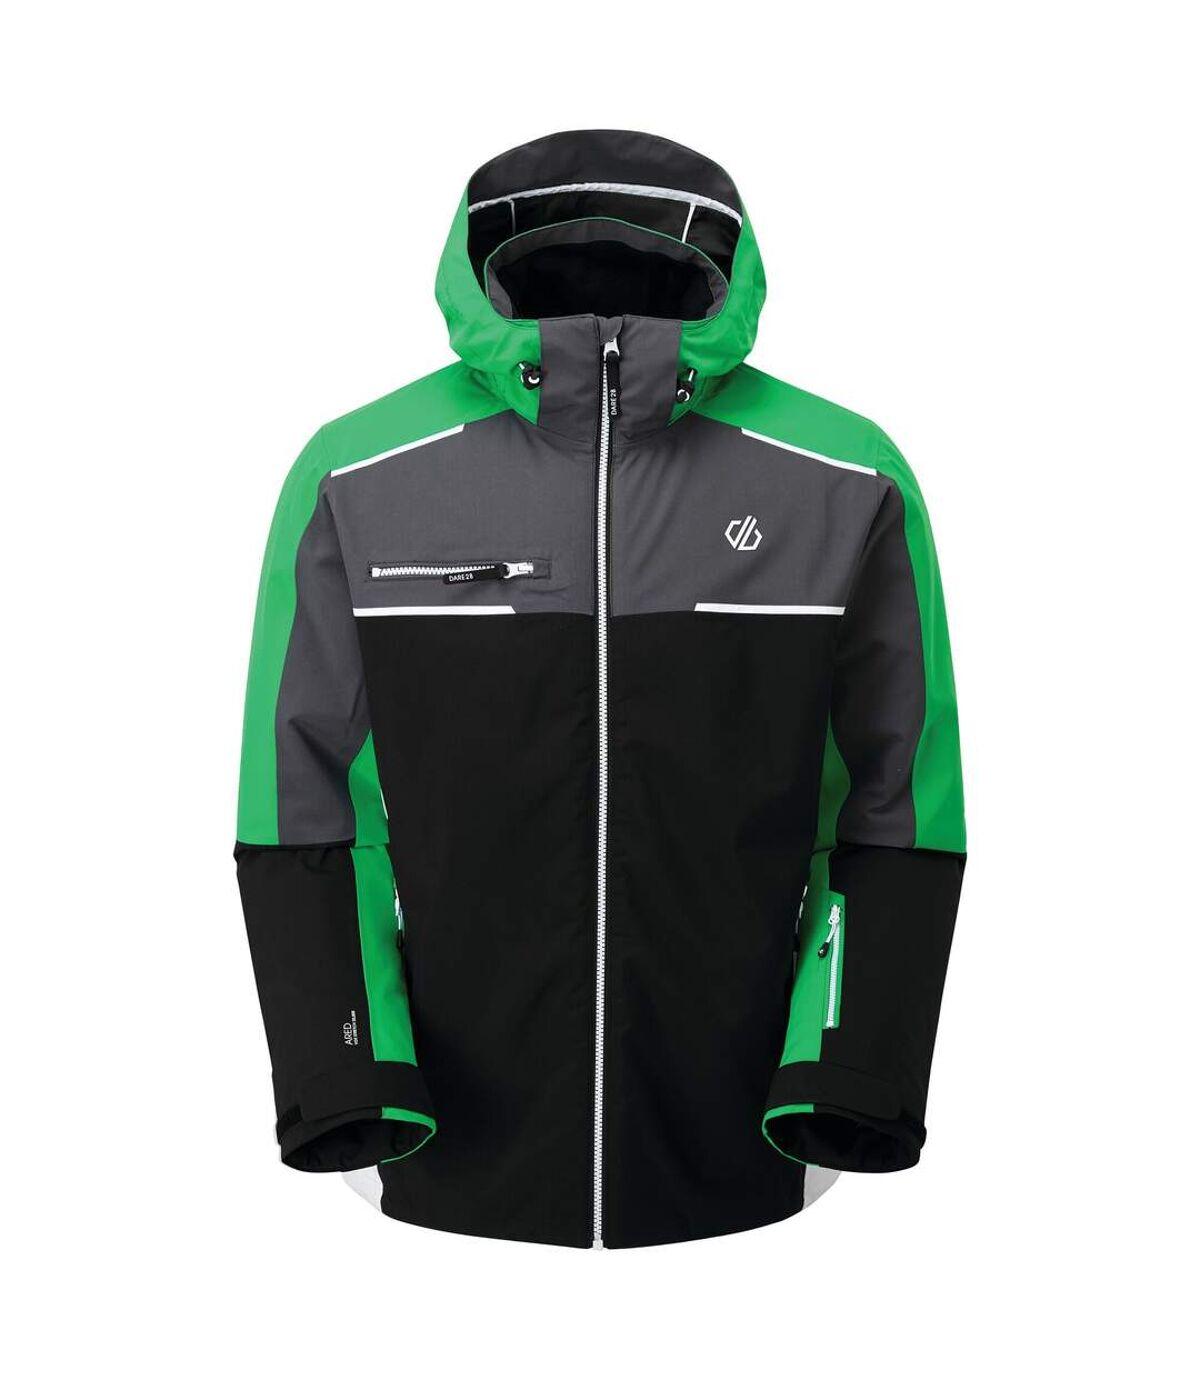 Dare 2B - Blouson de ski INTERMIT - Homme (Noir/vert vif) - UTRG5514